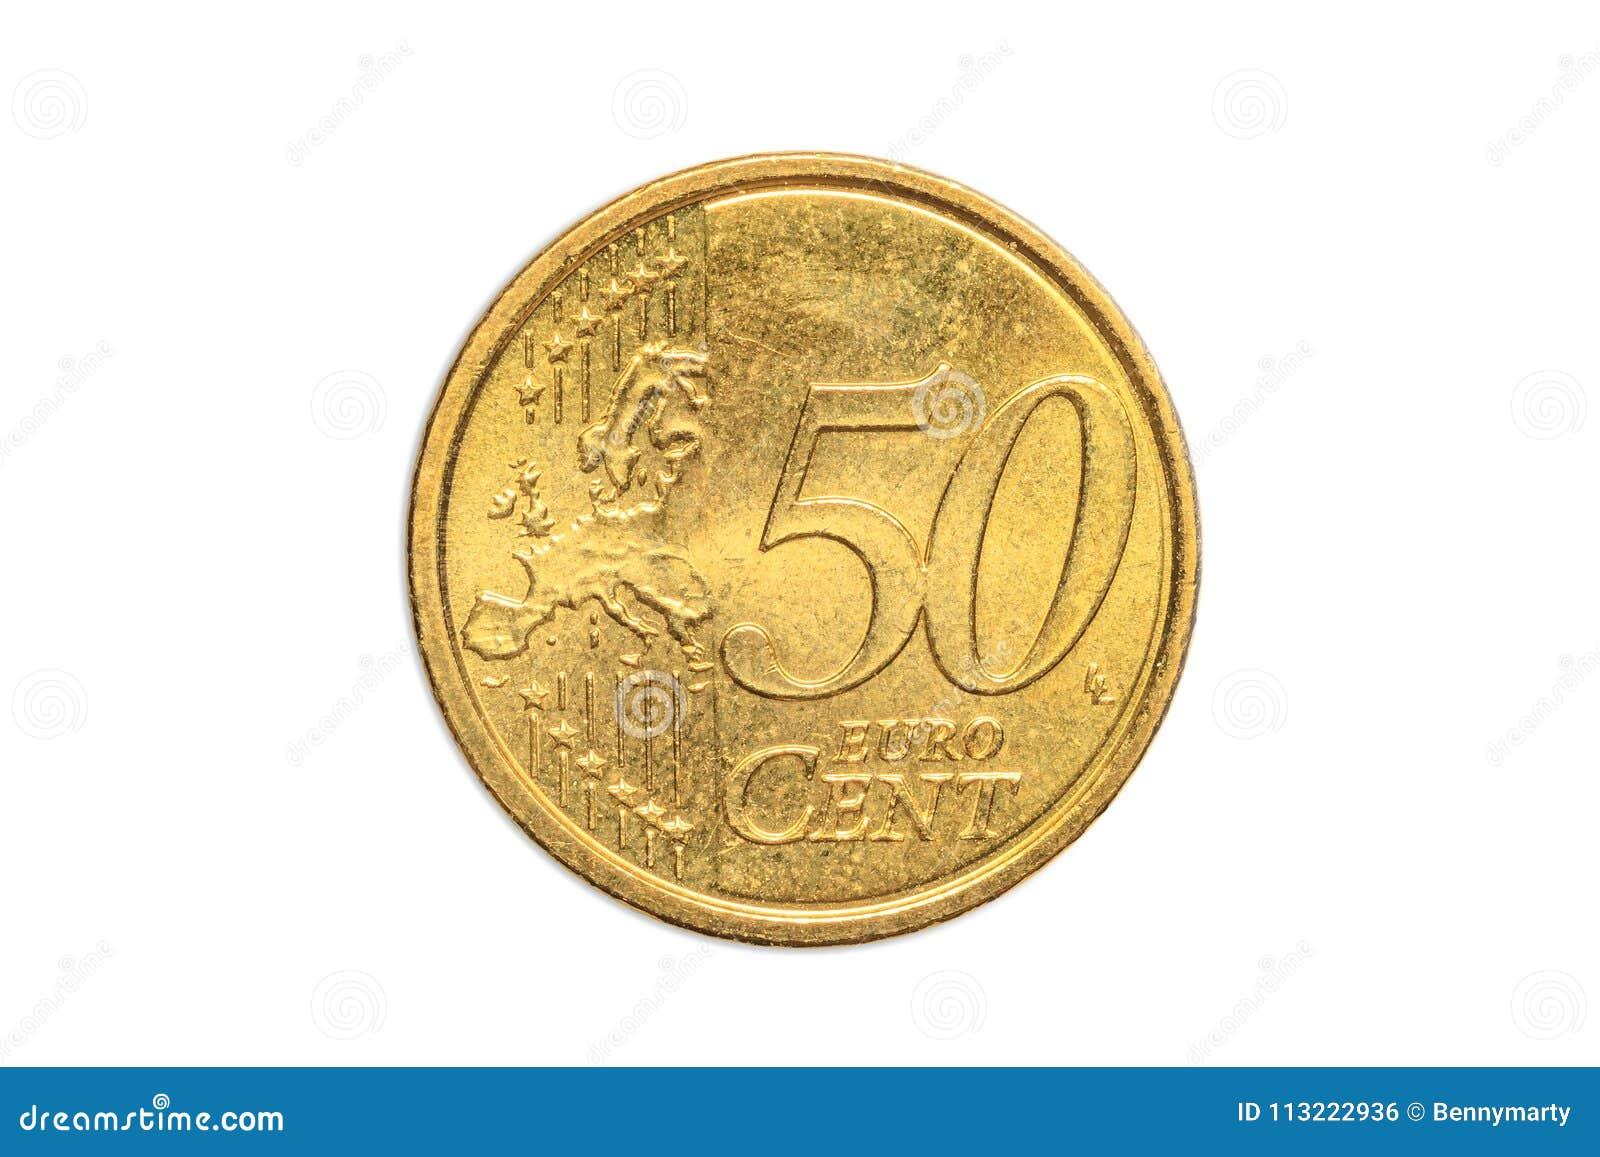 Europe 50 euro cents